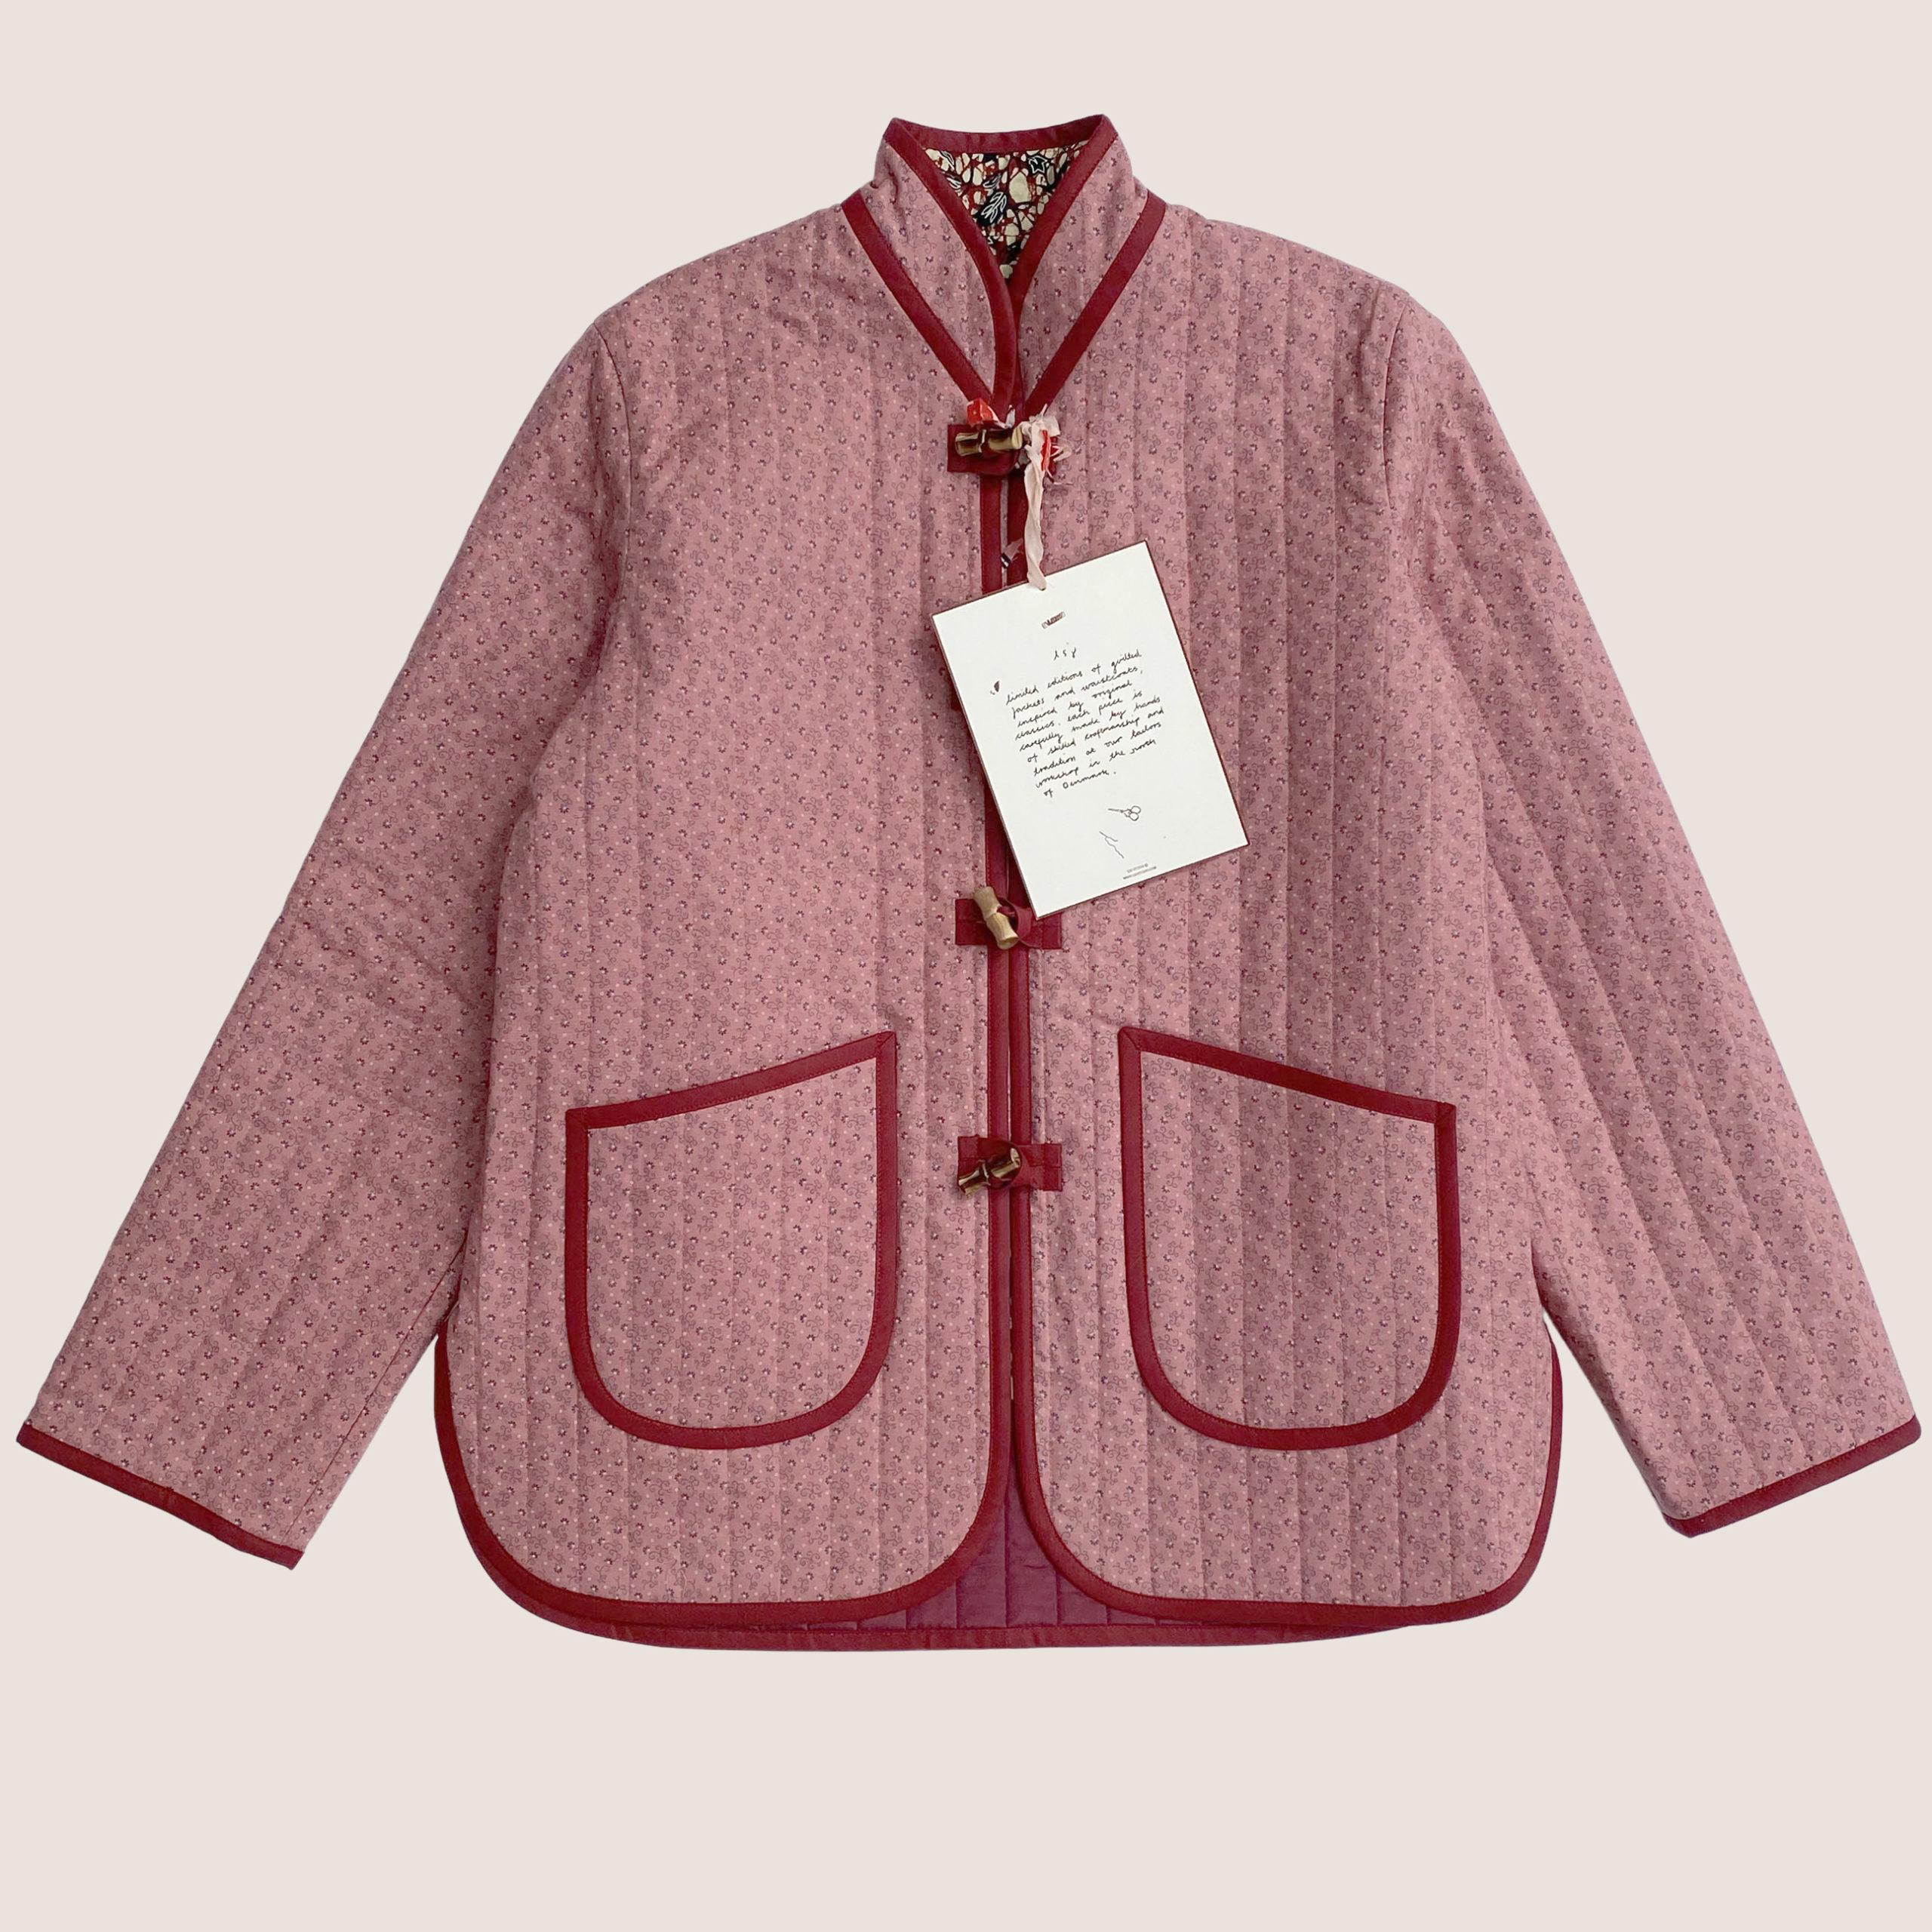 The Original Quilt Jacket - Rosewood